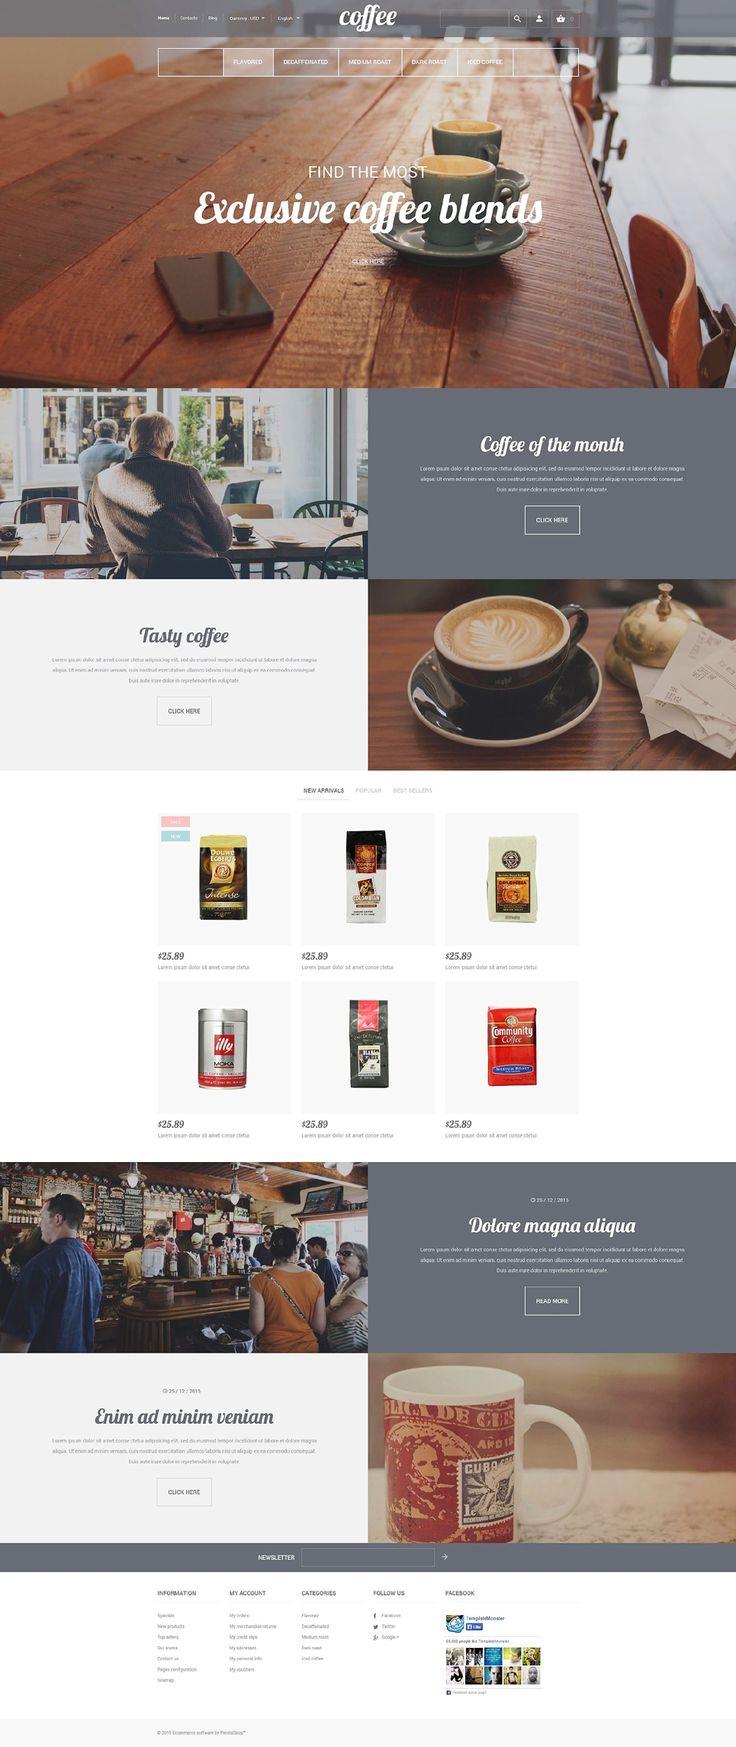 Coffee Shop Responsive PrestaShop Template http://www.templatemonster.com/prestashop-themes/56108.html?utm_source=pinterest&utm_medium=timeline&utm_campaign=cofprsh